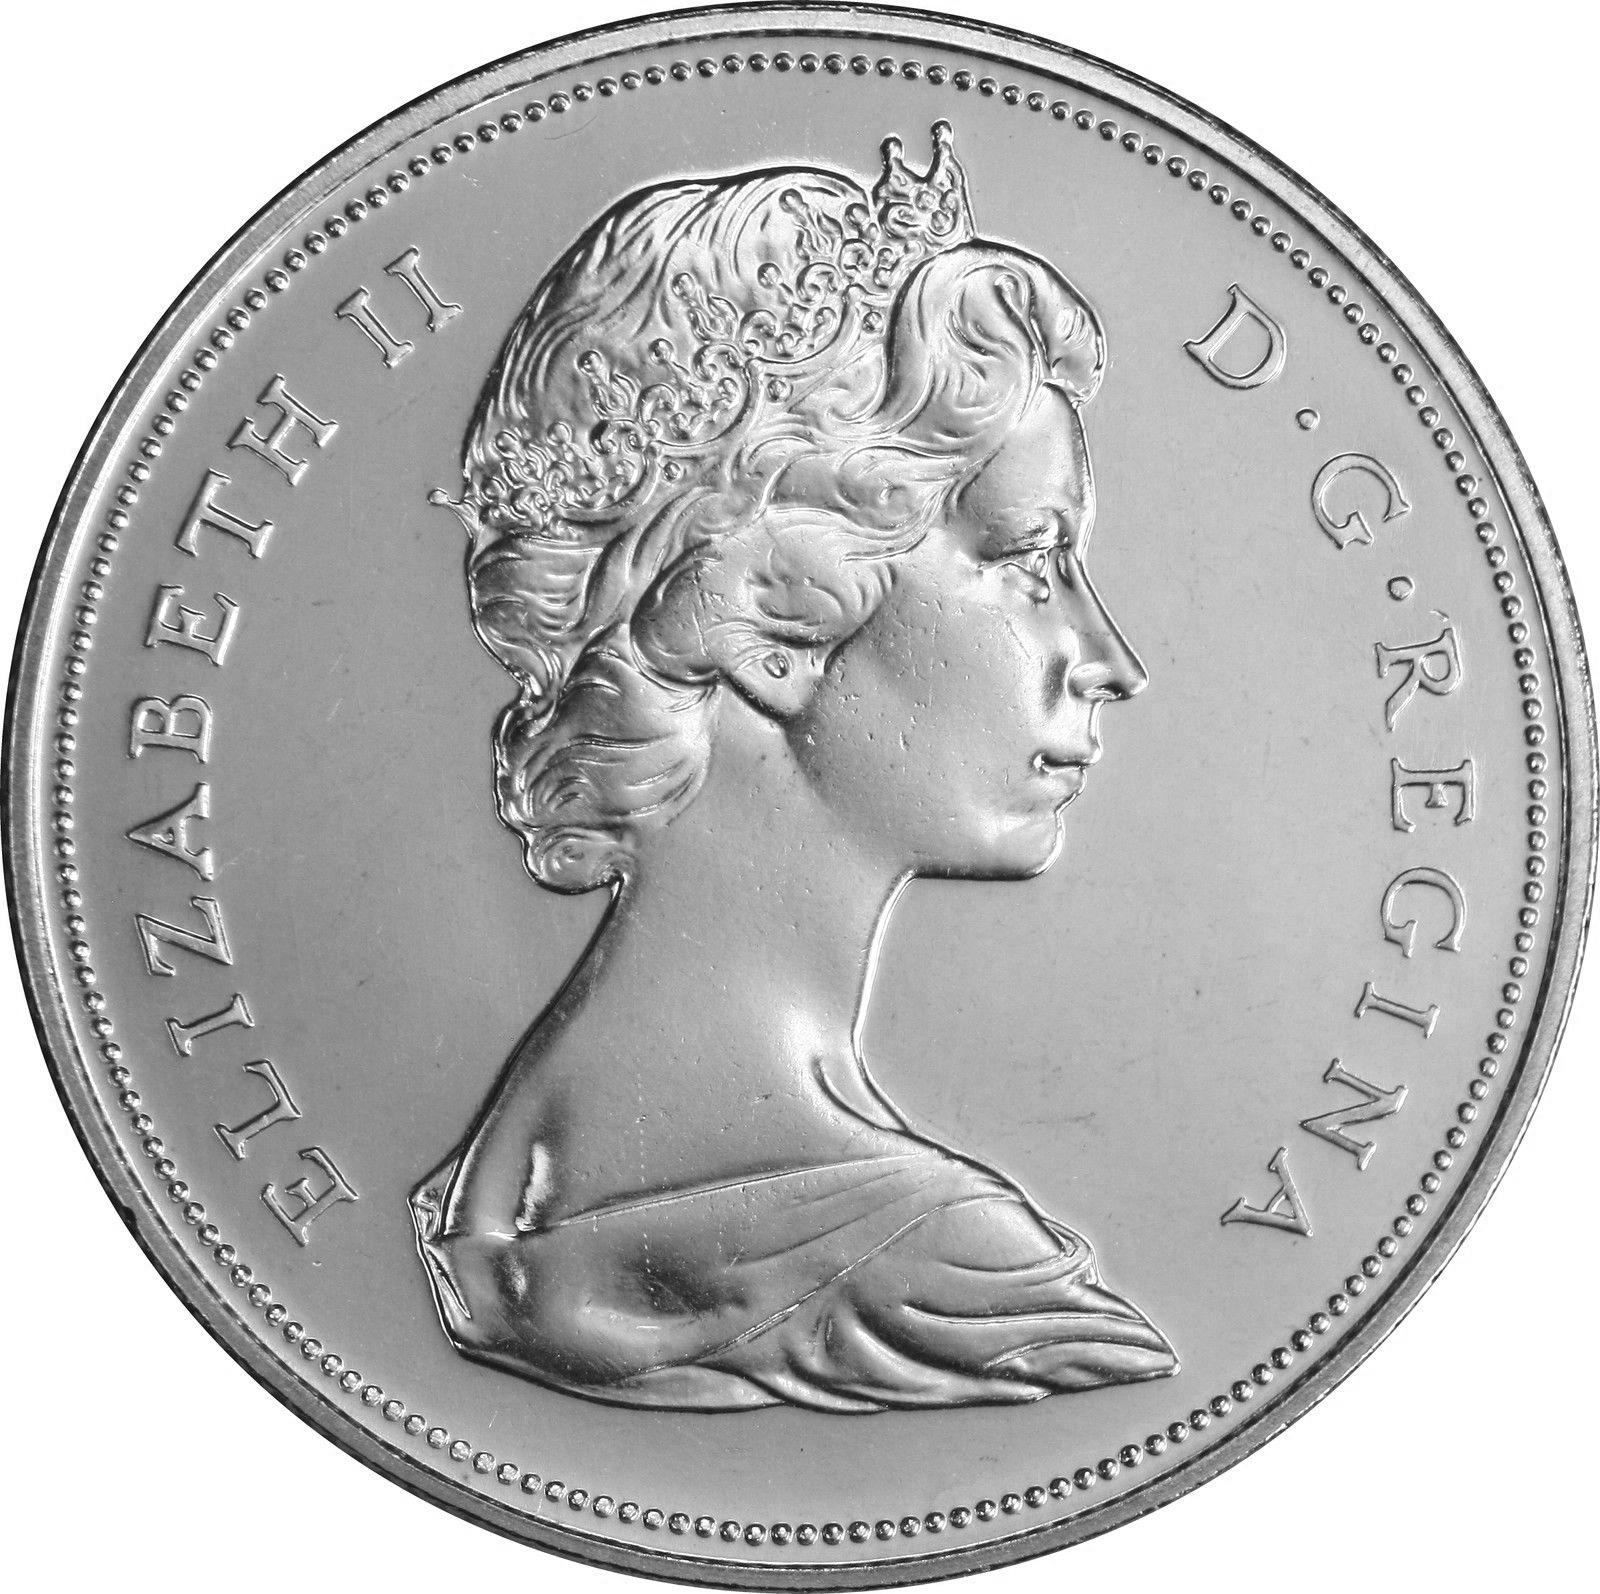 Canadian 1 Dollar Coin Obverse Design Evolution (1935-1987)